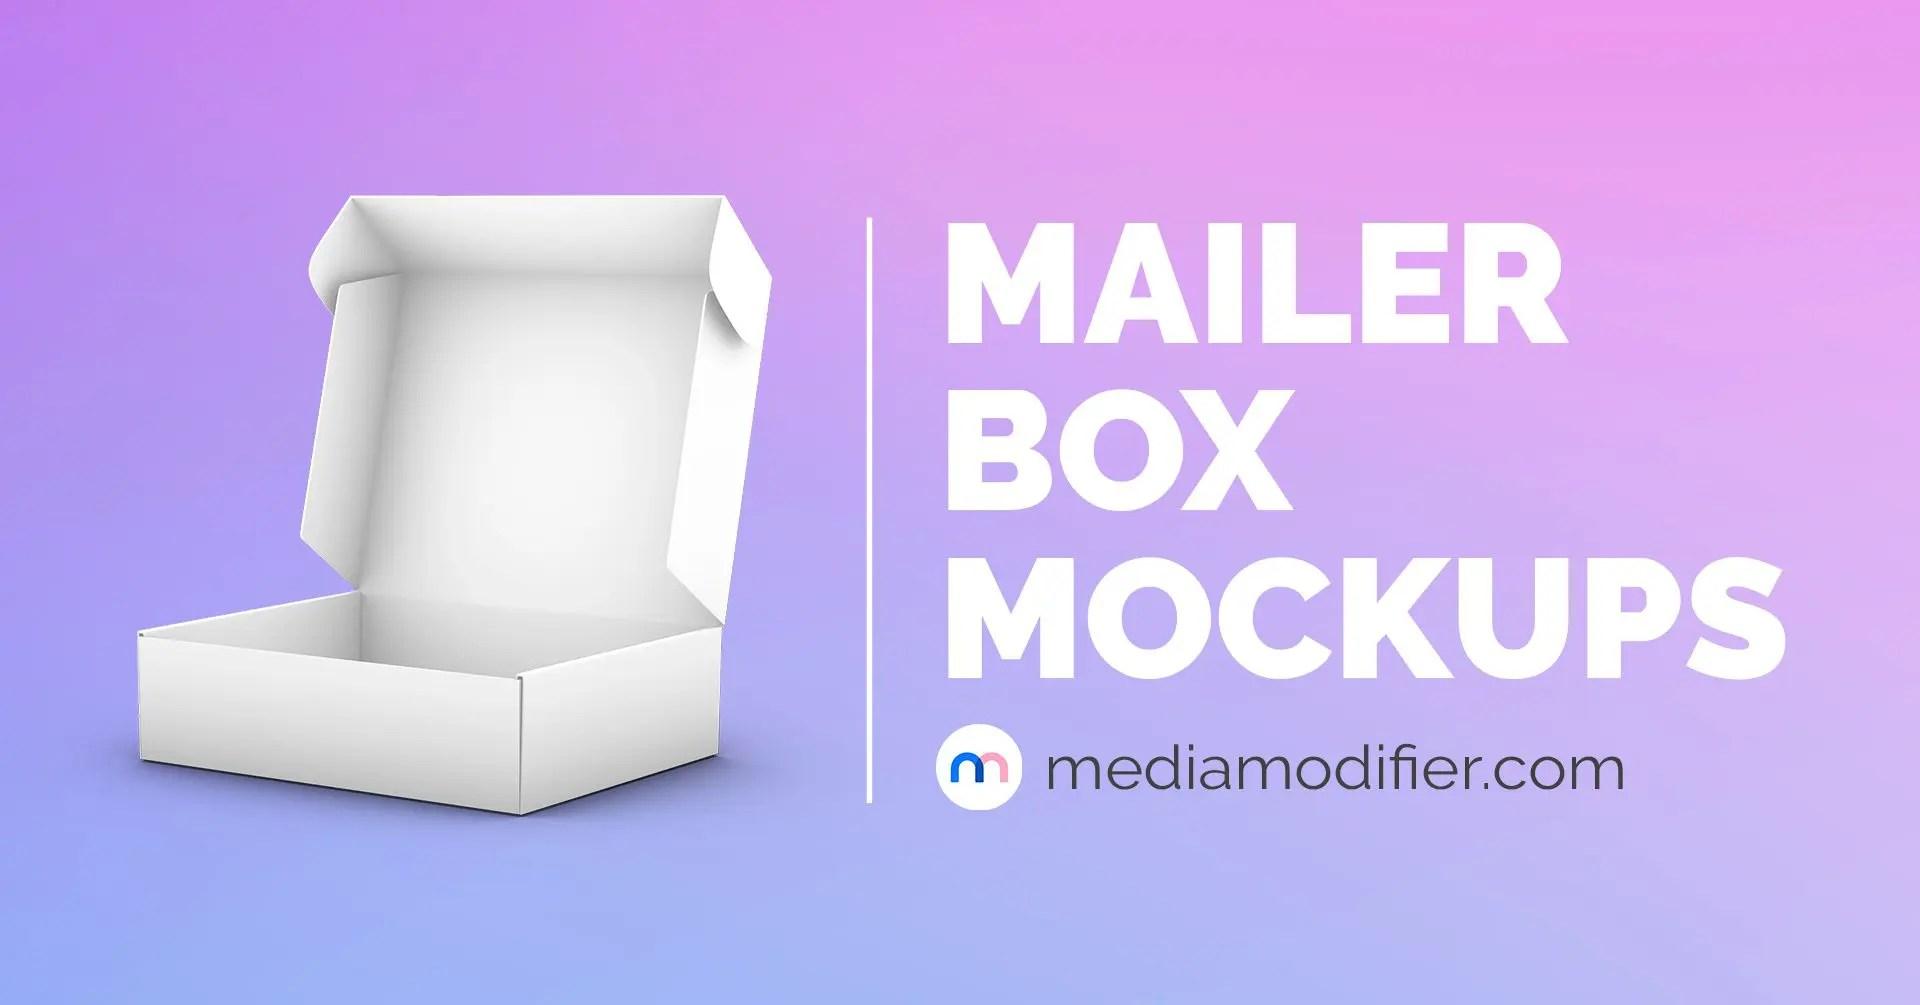 Free open card box mockup description details. 15 Best Mailer Box Mockups Mediamodifier